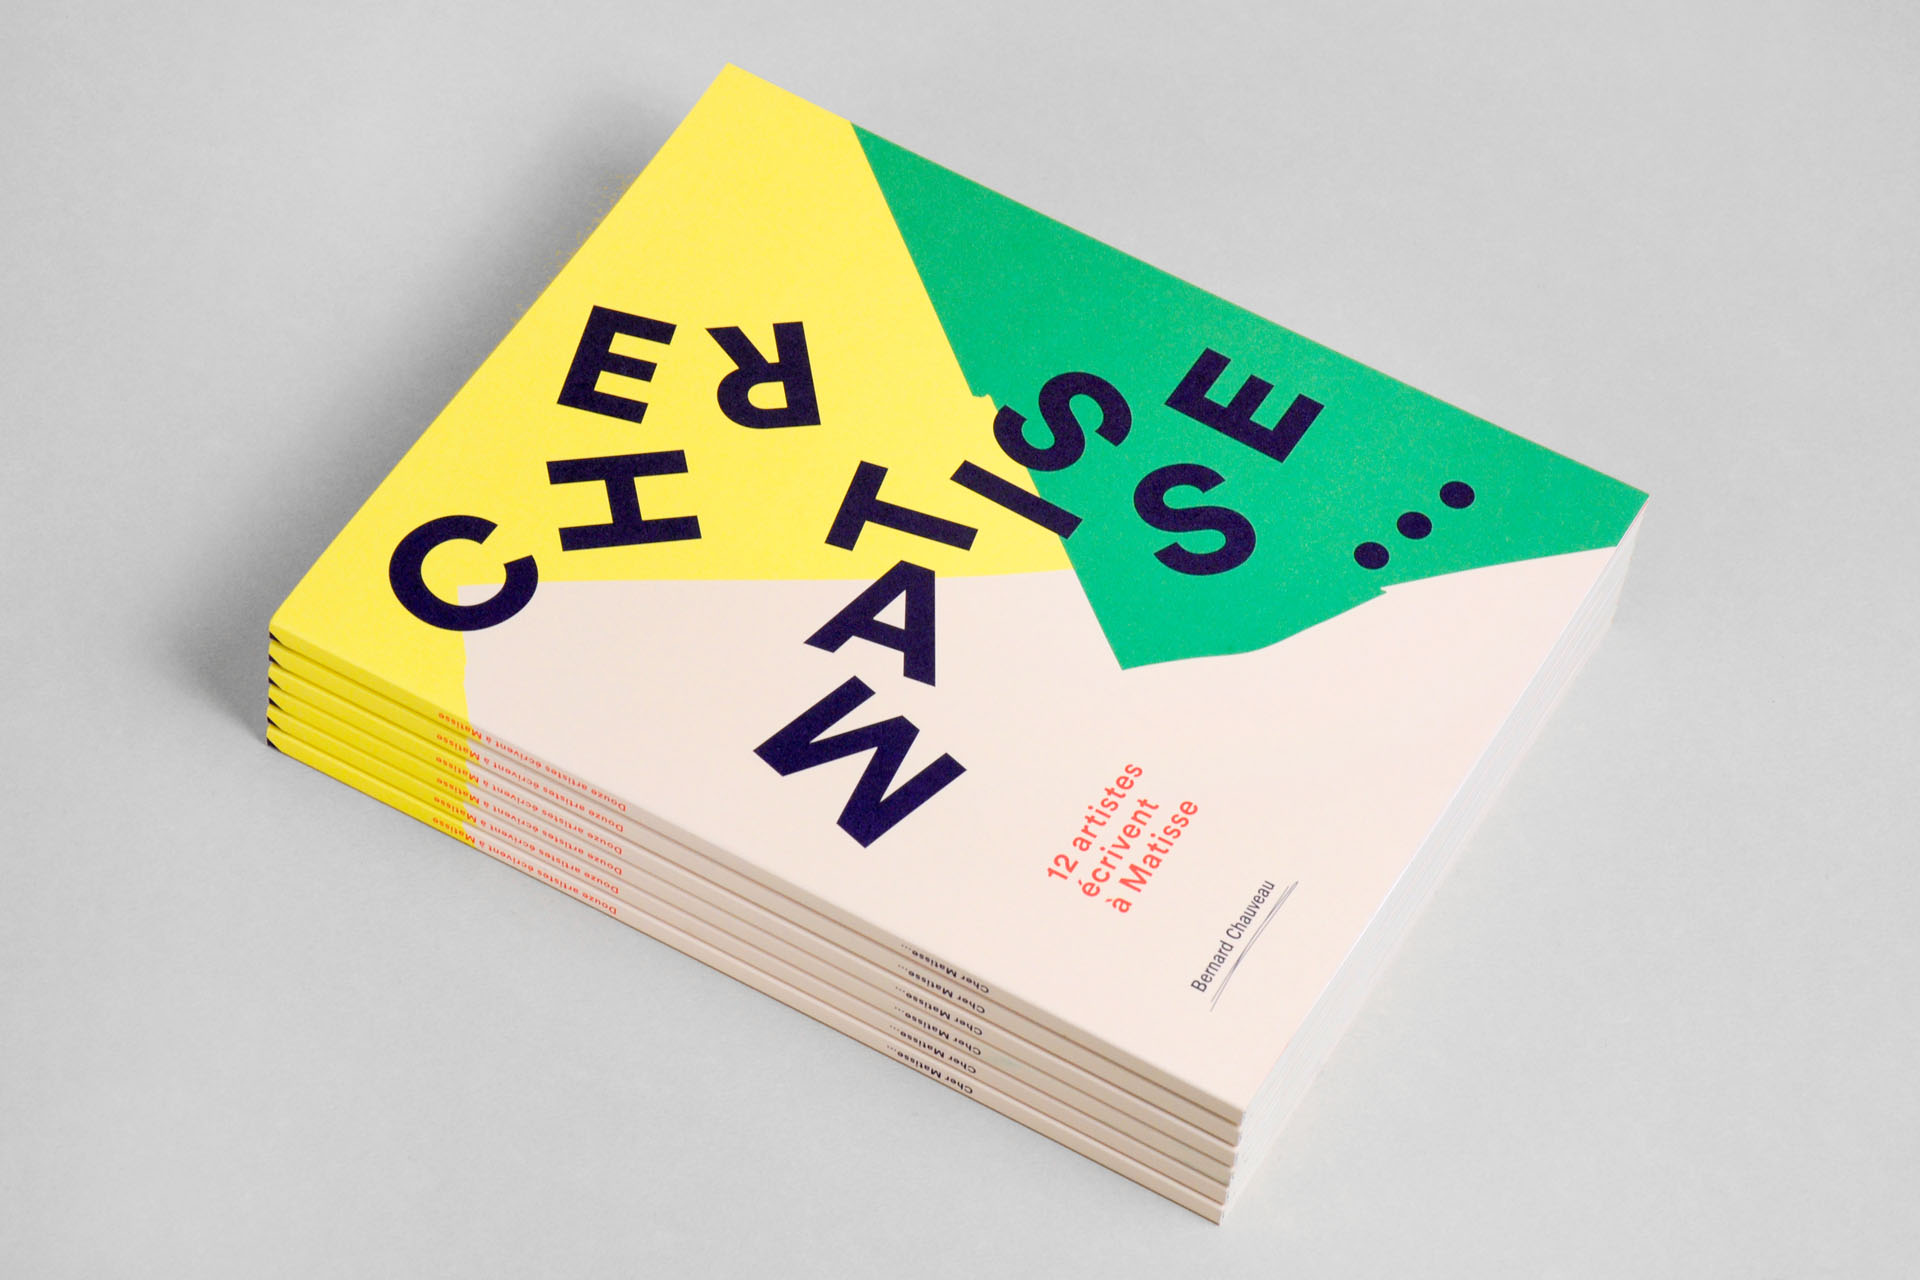 cher-henri-matisse-bernard-chauveau-edition-plastac-01